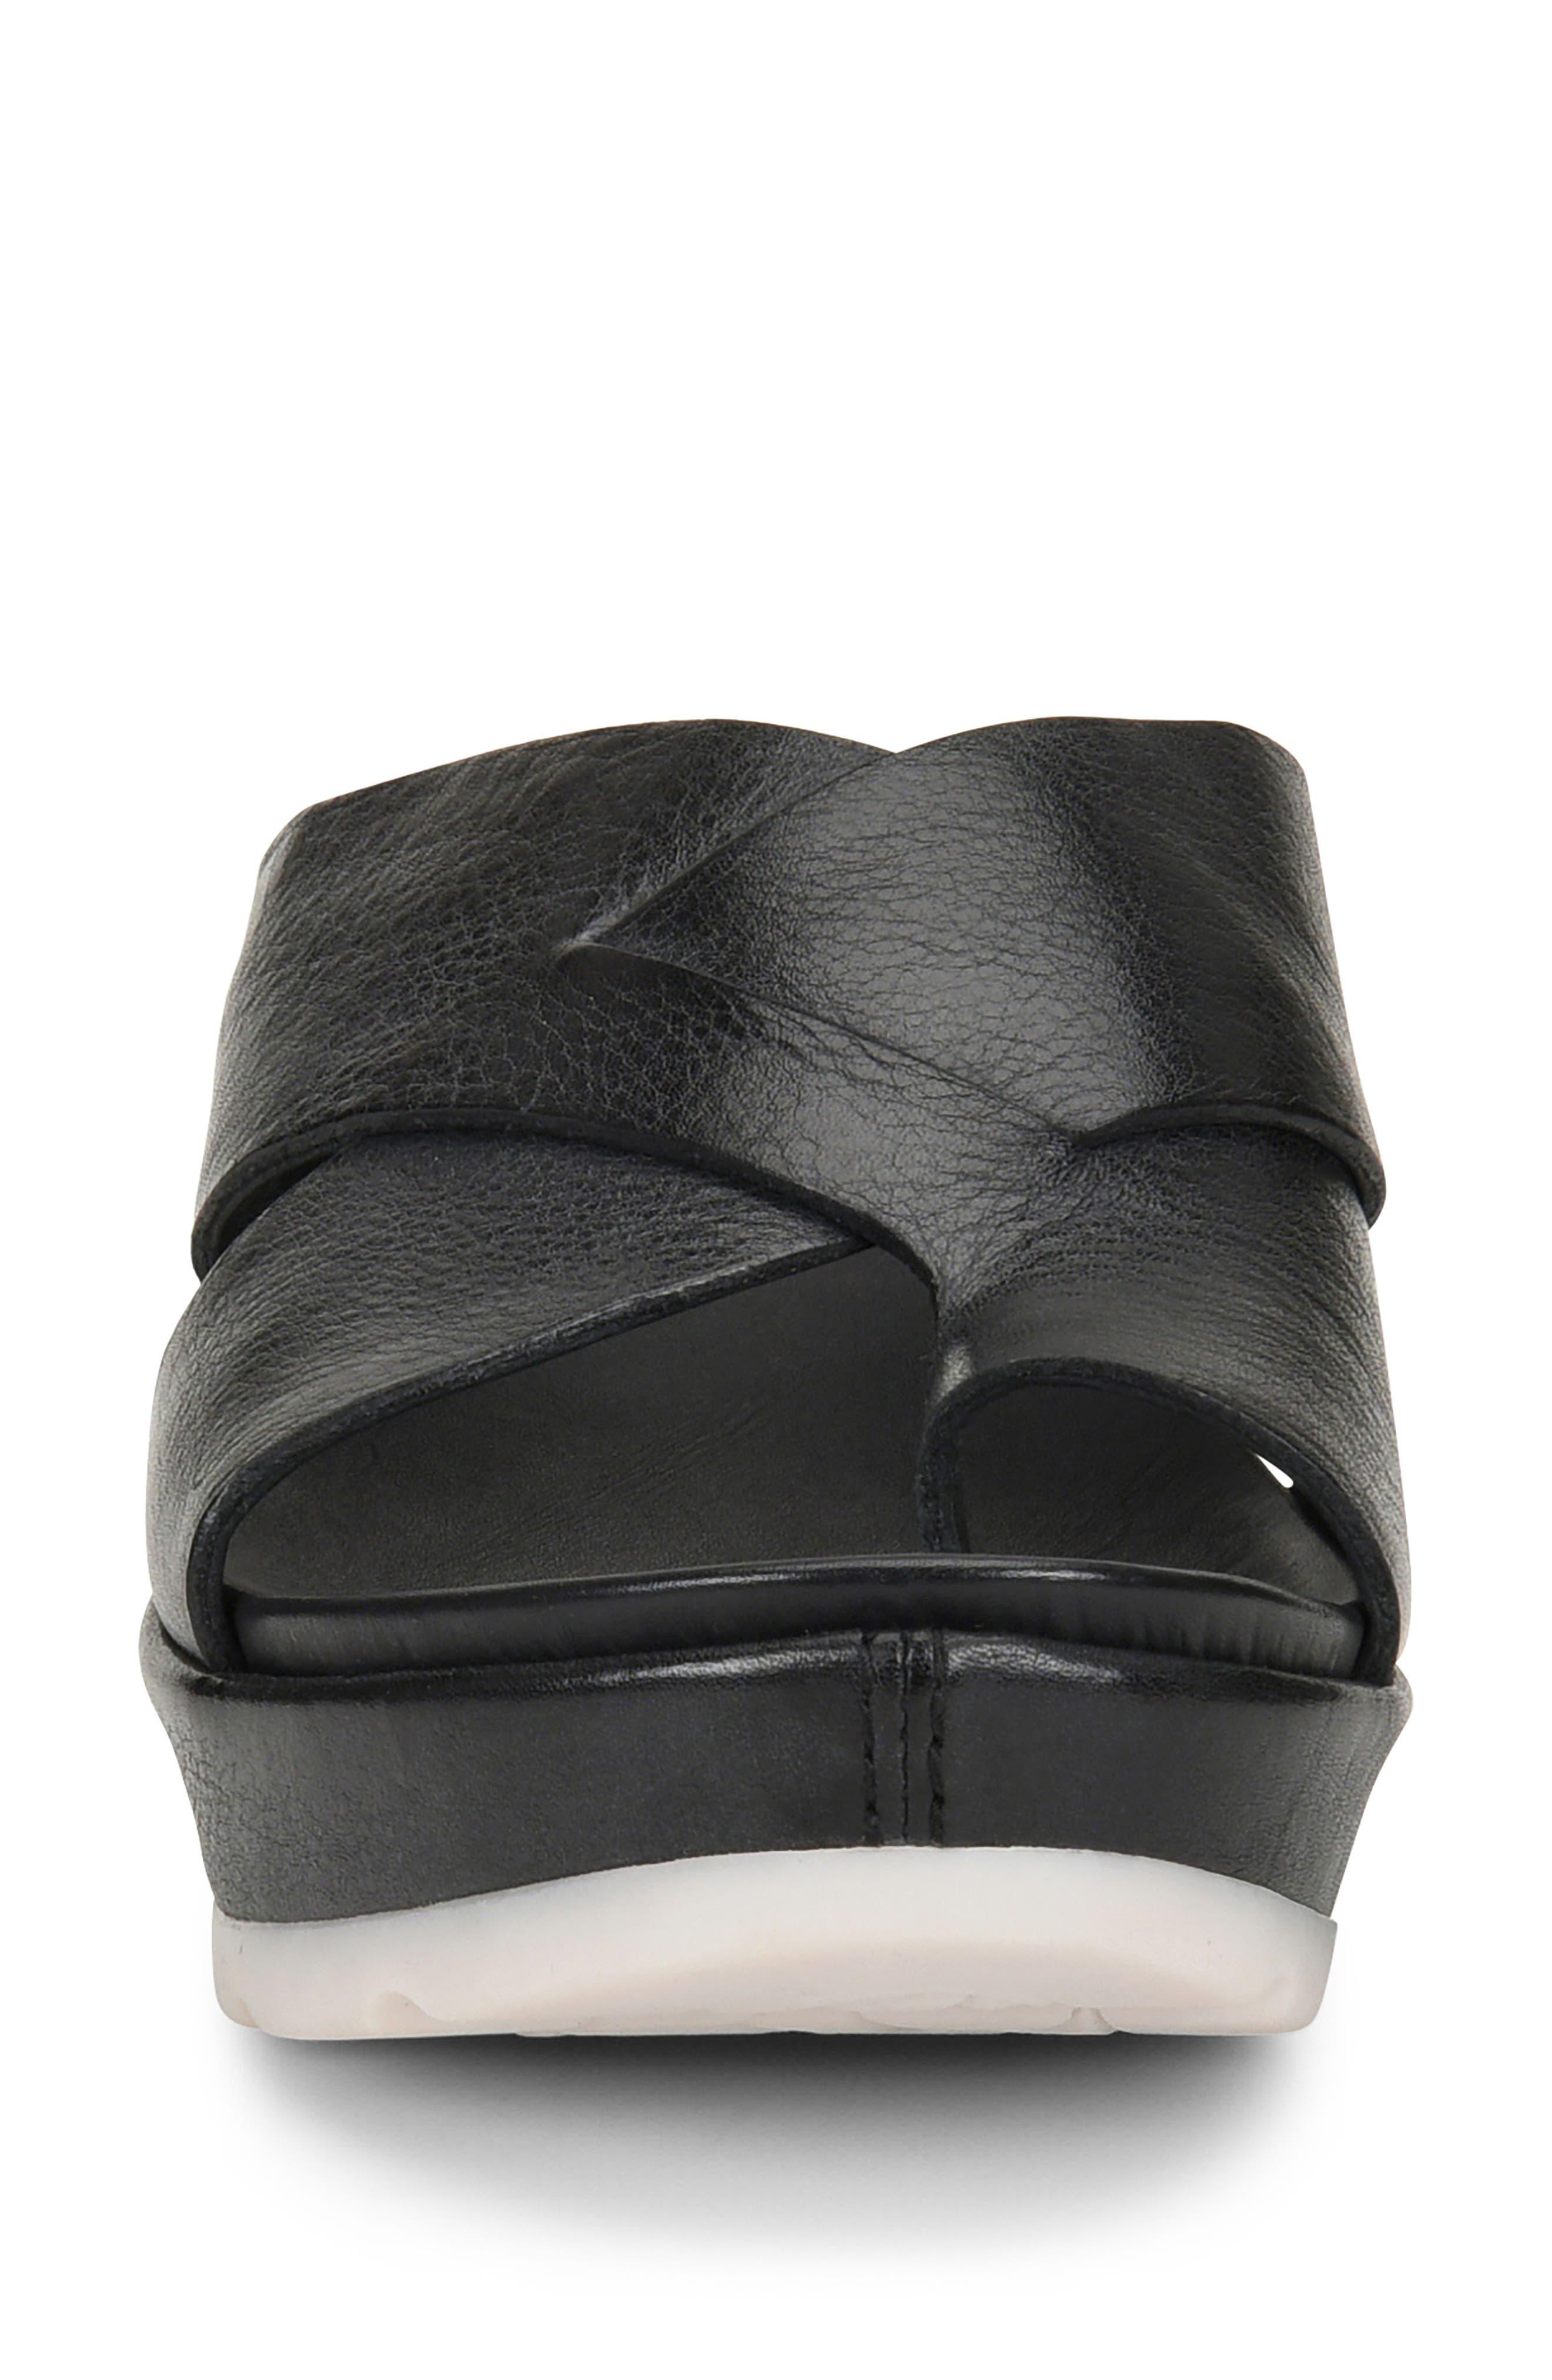 KORK-EASE<SUP>®</SUP>, Baja Sport Slide Sandal, Alternate thumbnail 4, color, BLACK LEATHER